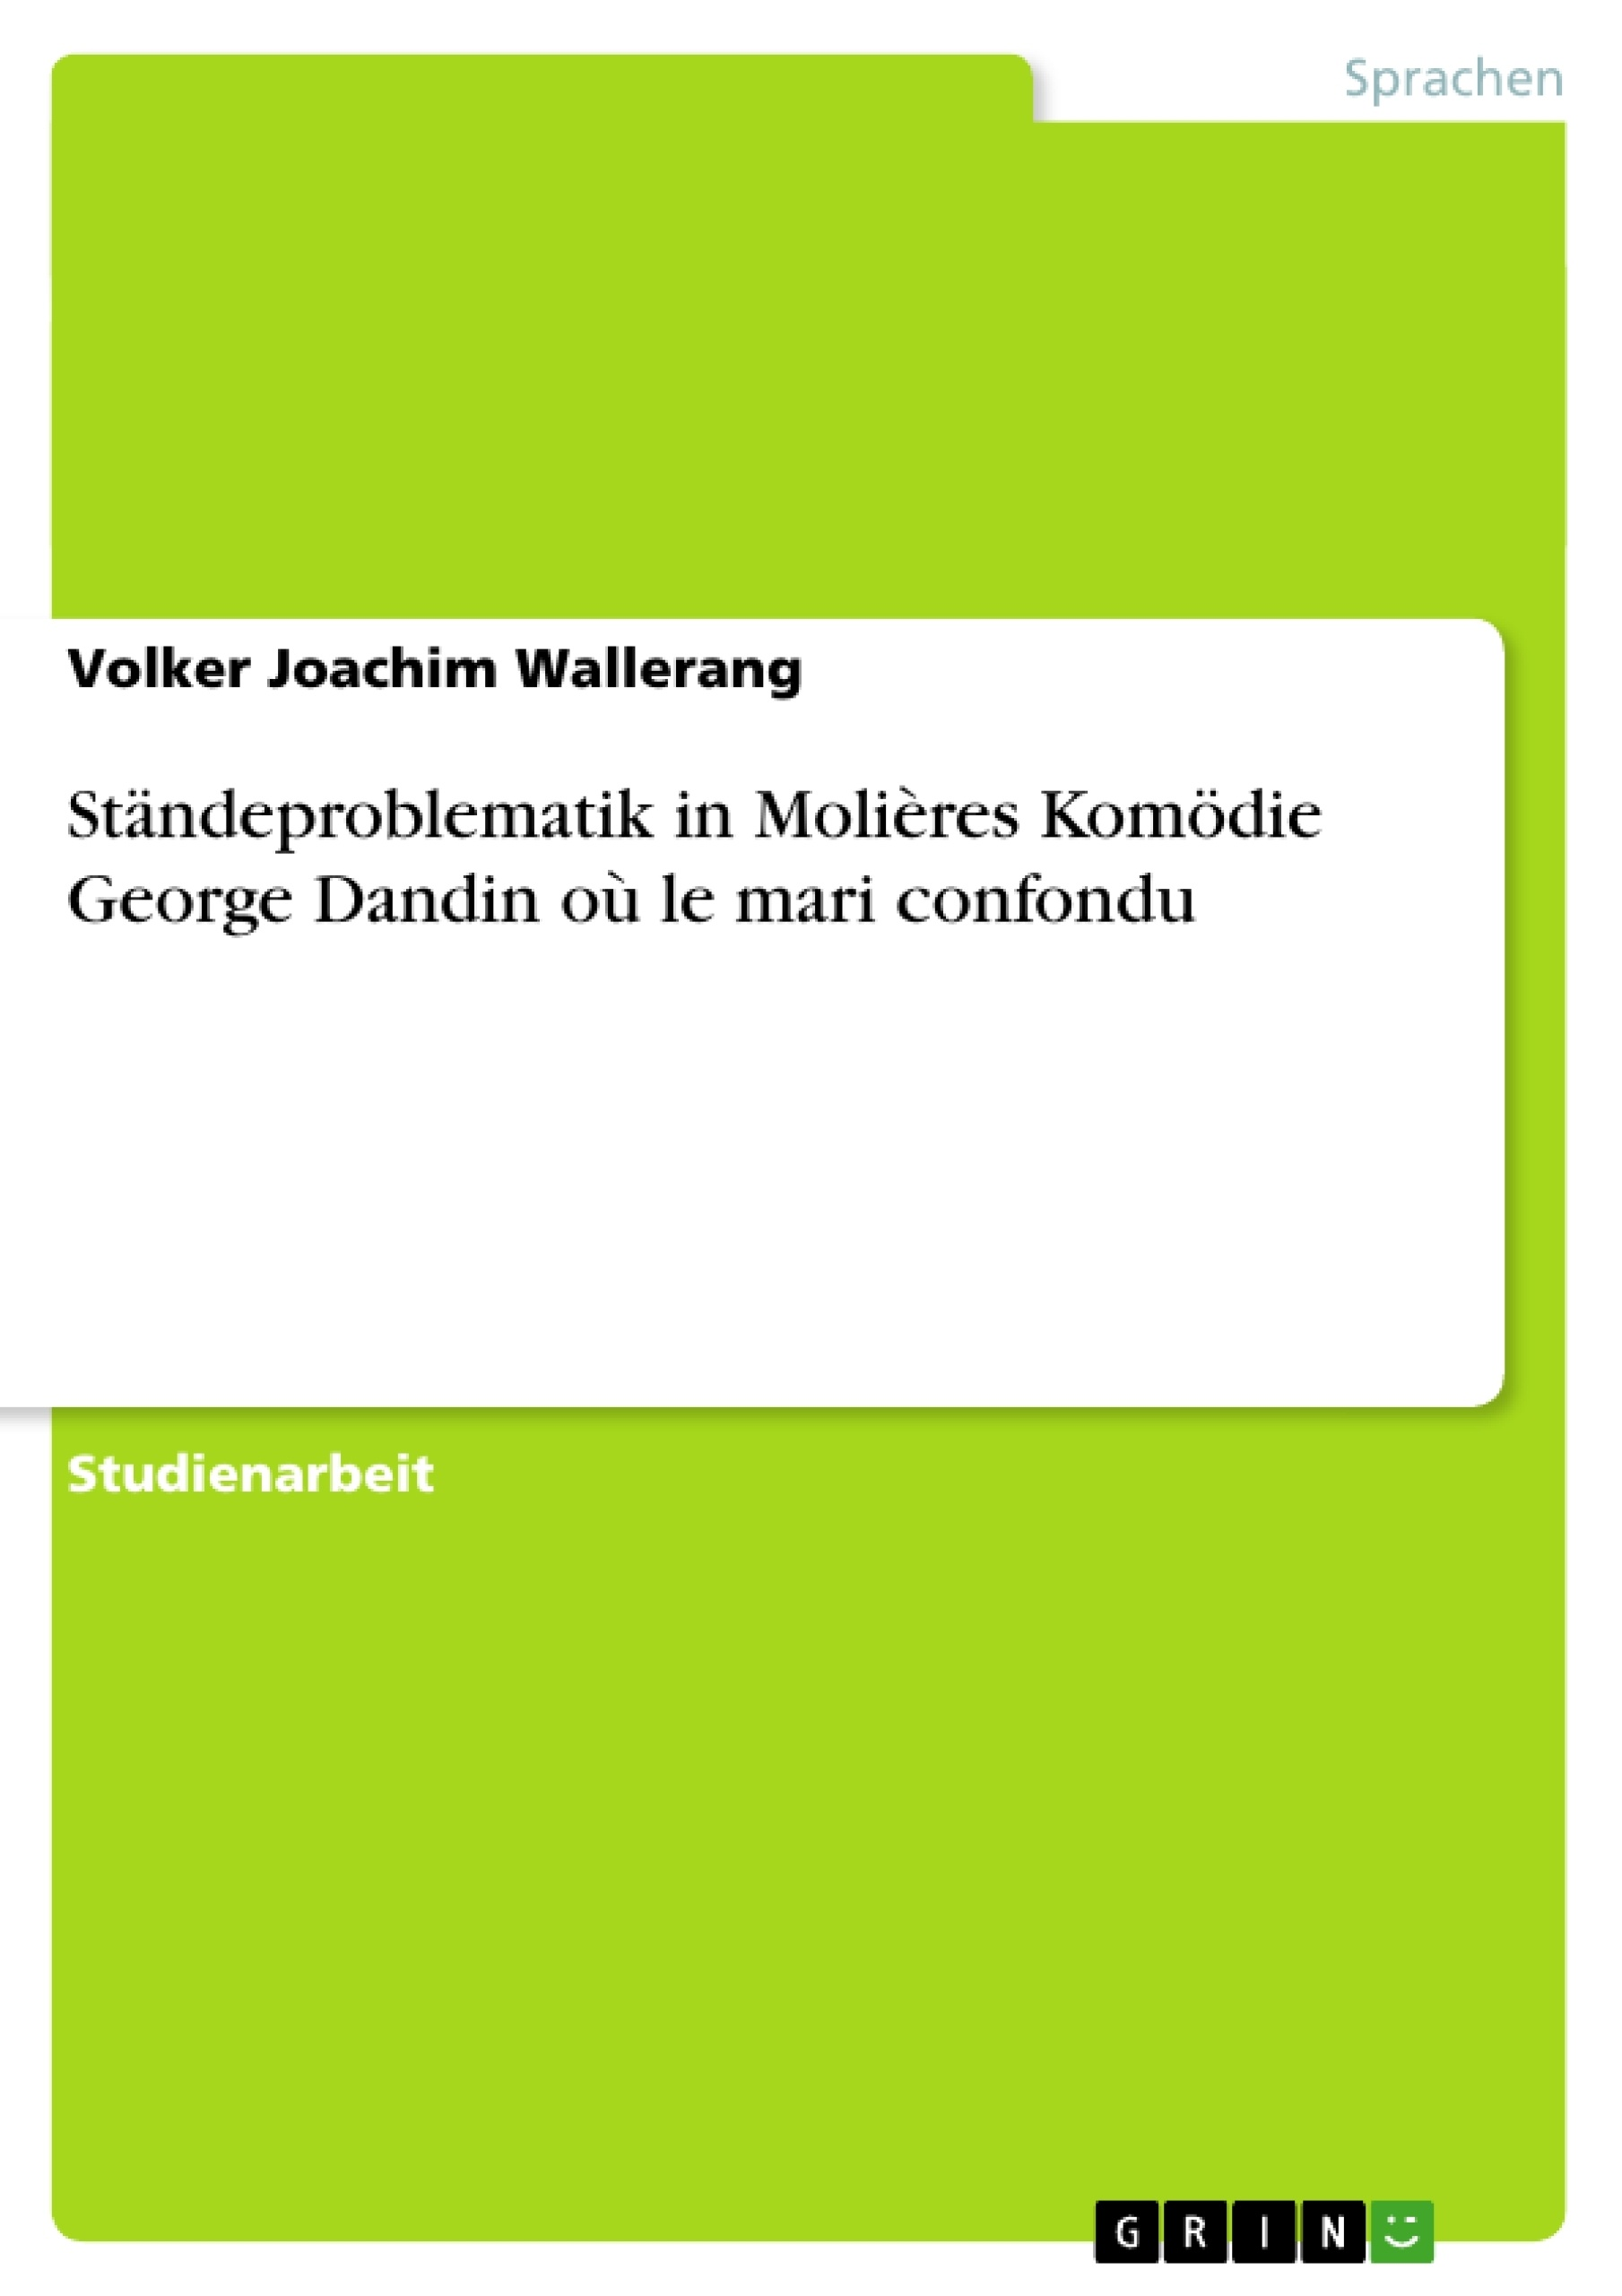 Titel: Ständeproblematik in Molières Komödie George Dandin où le mari confondu